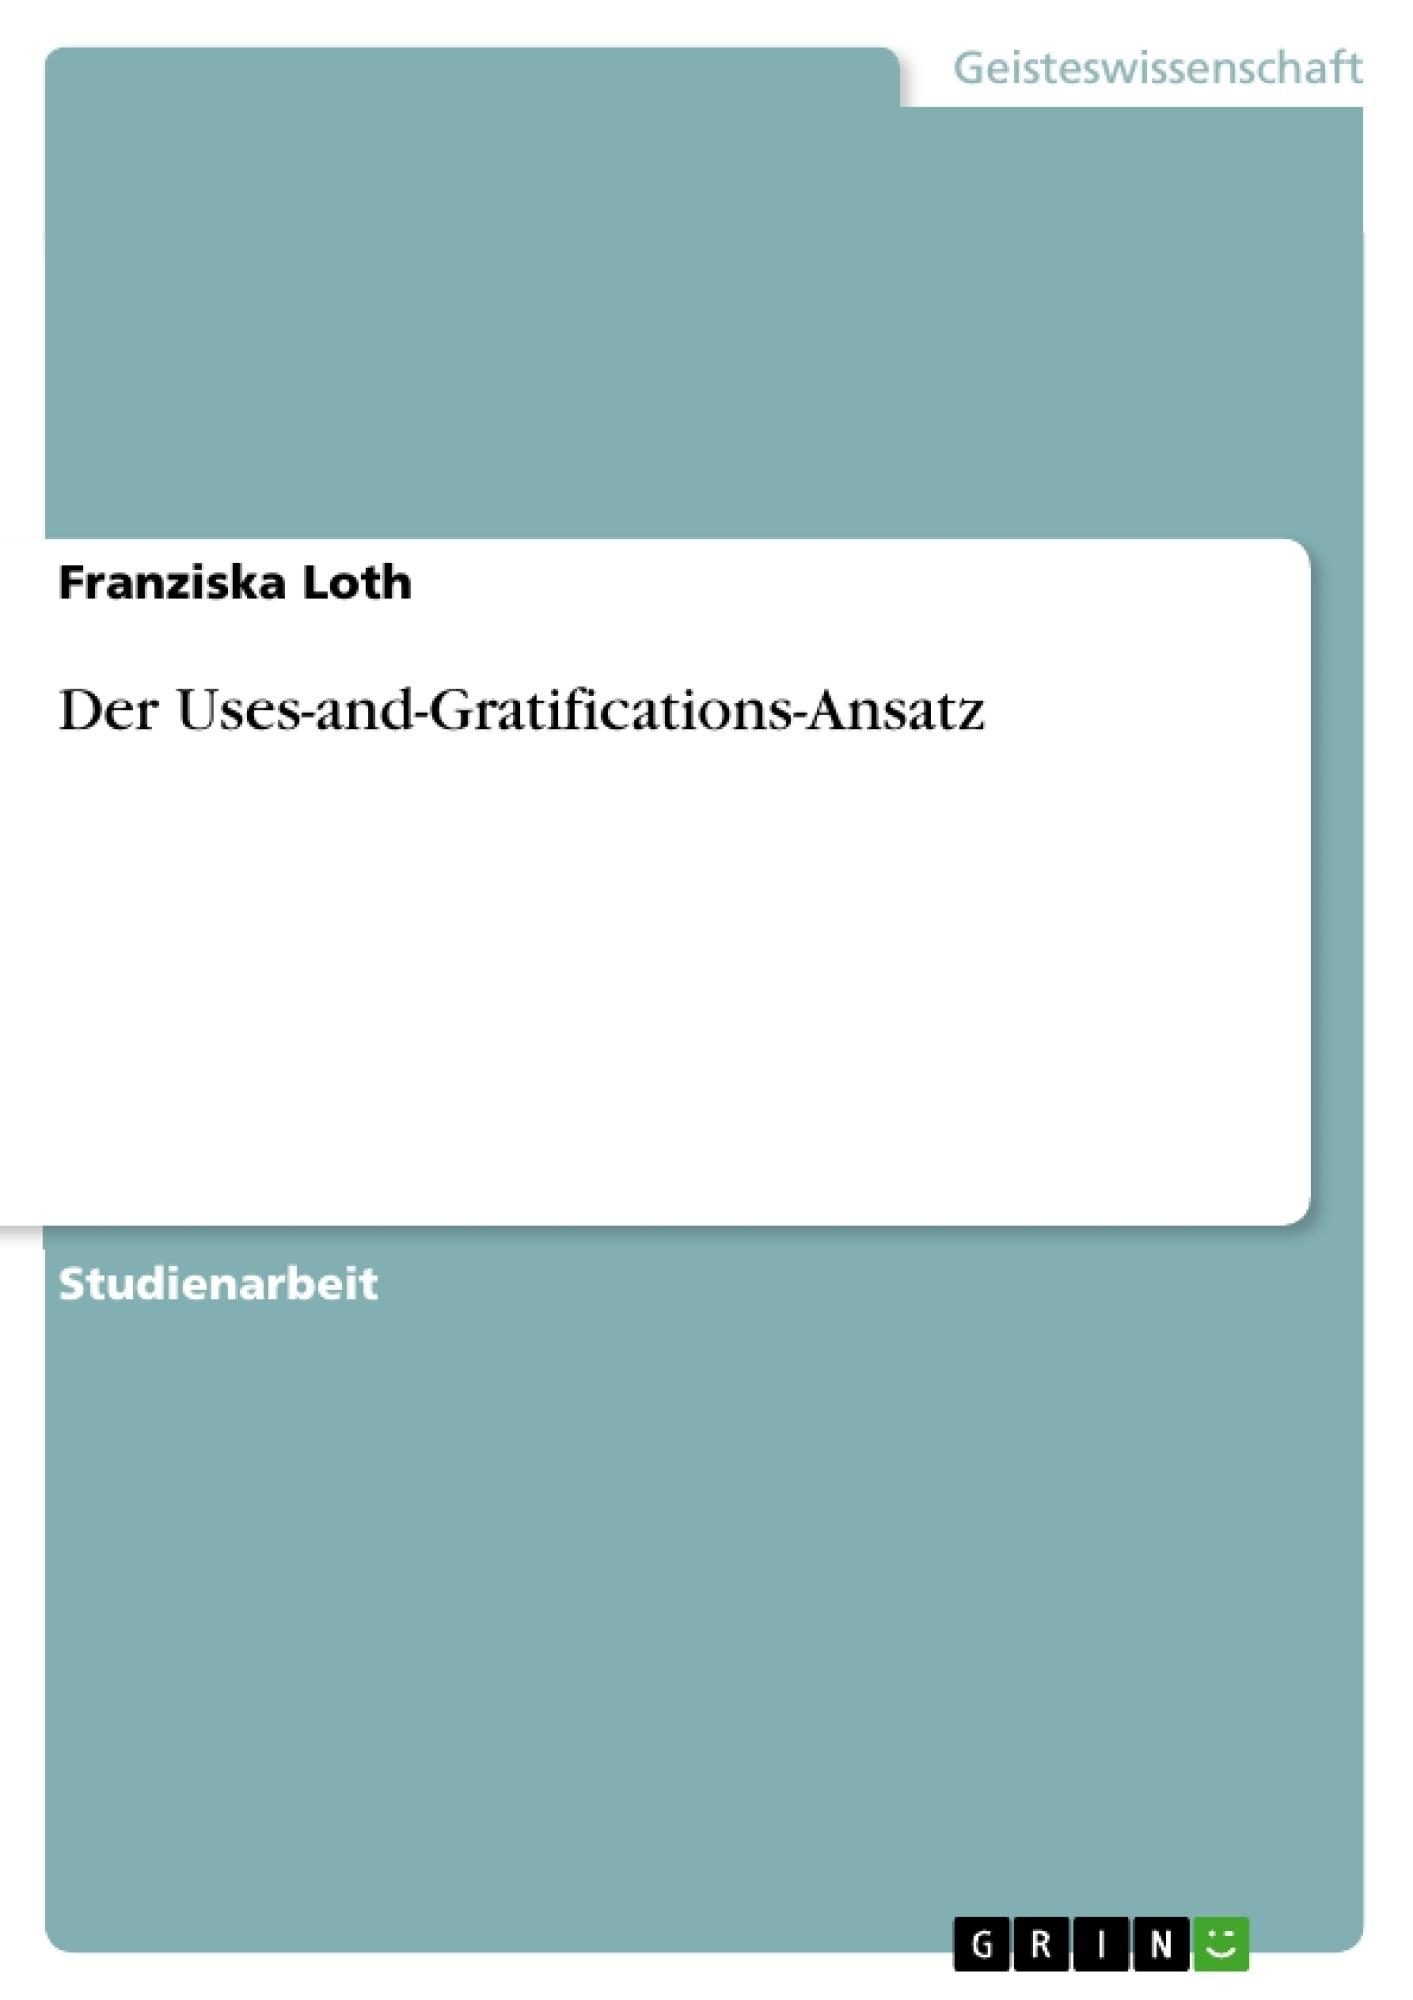 Titel: Der Uses-and-Gratifications-Ansatz